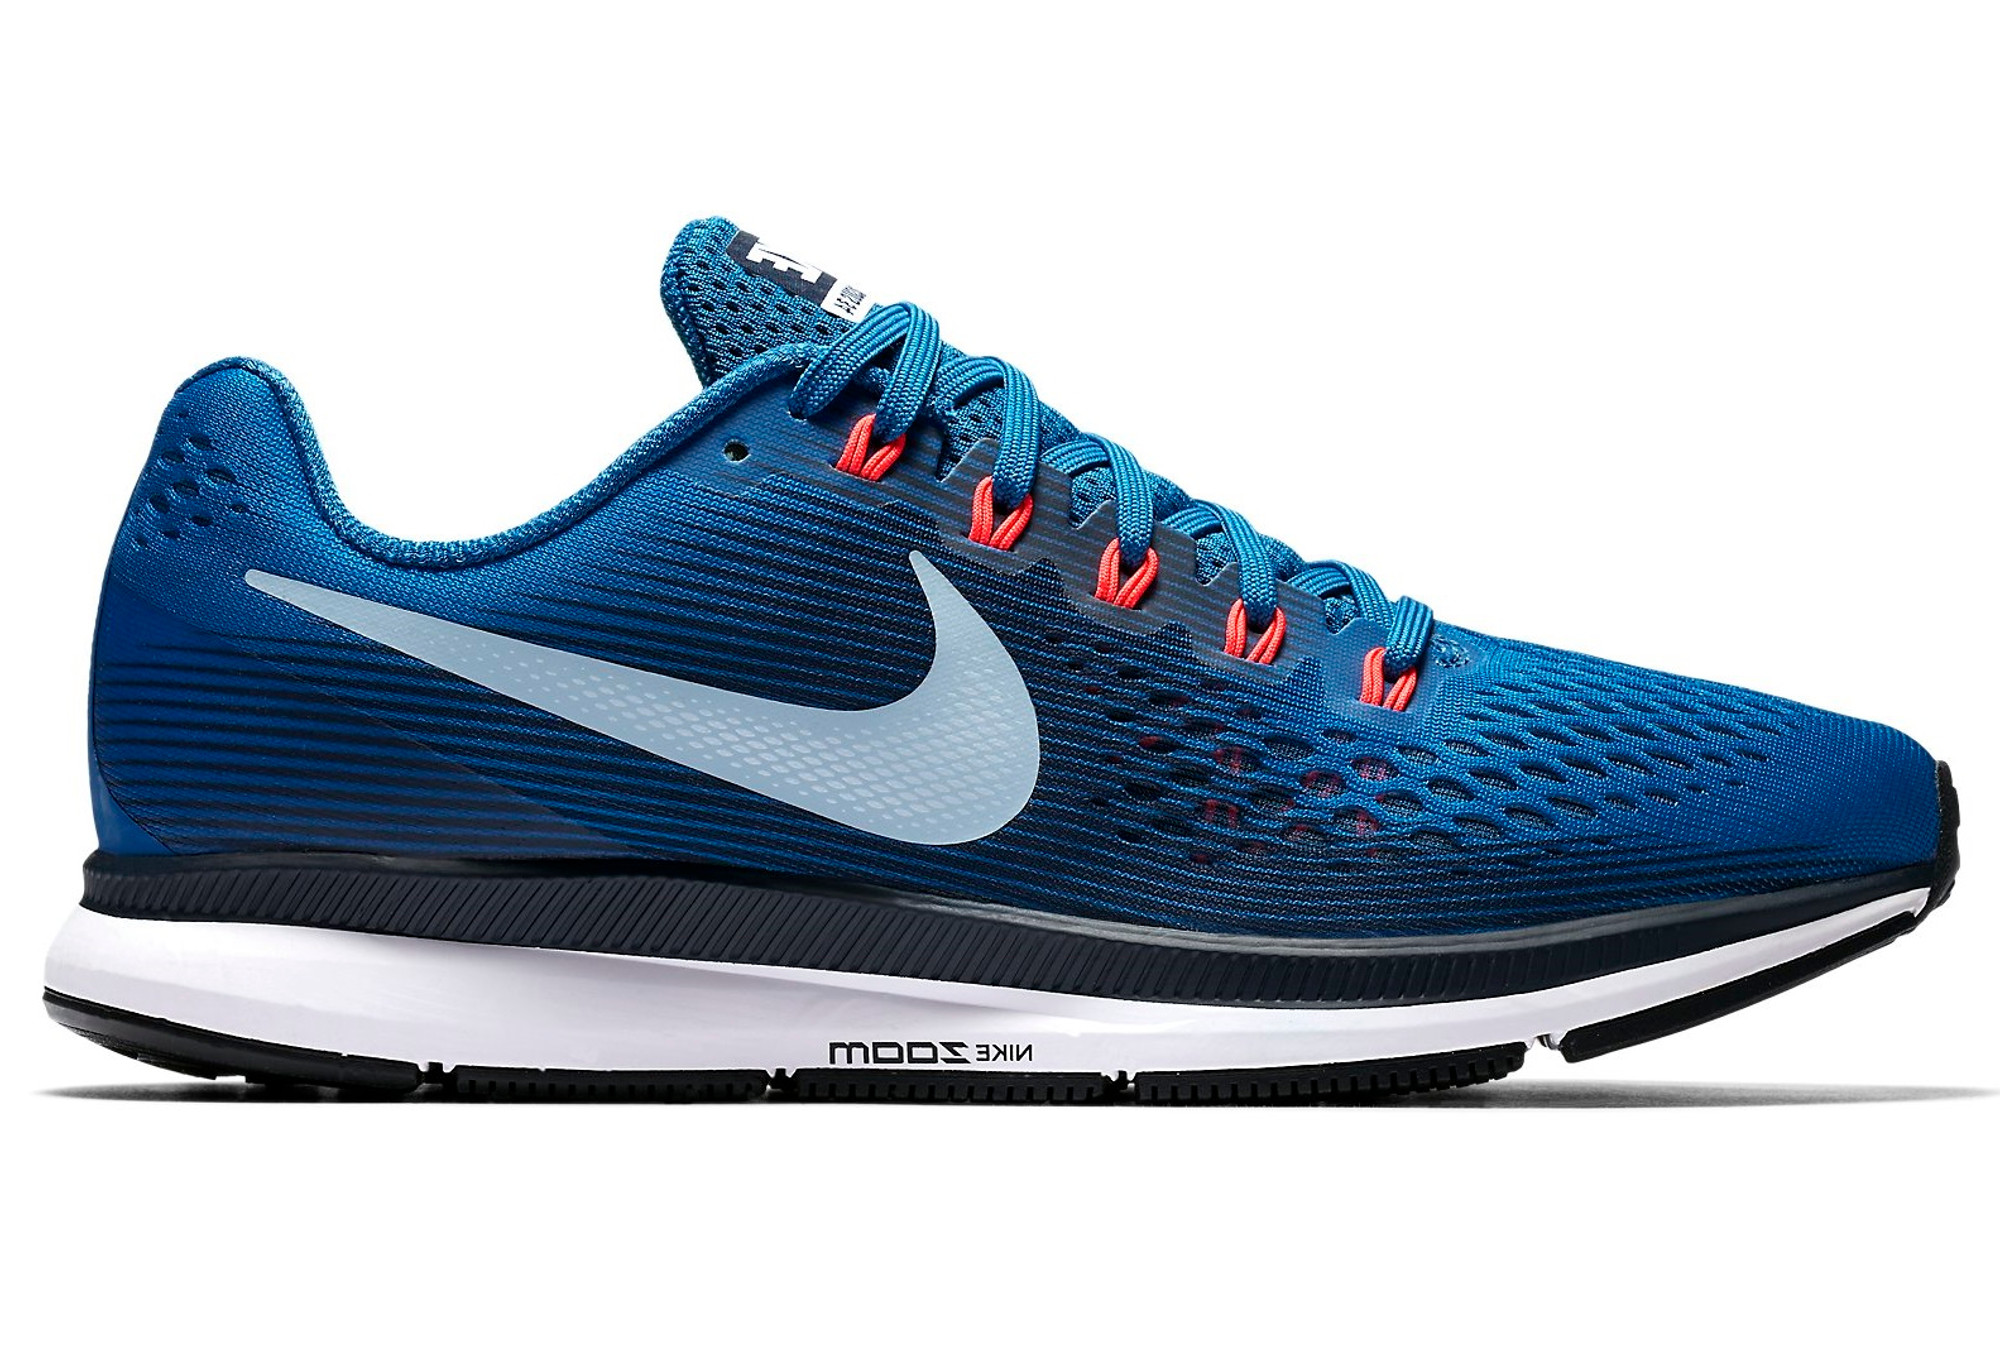 info for cb58e 1e390 Chaussures de Running Nike Air Zoom Pegasus 34 Bleu   Bleu